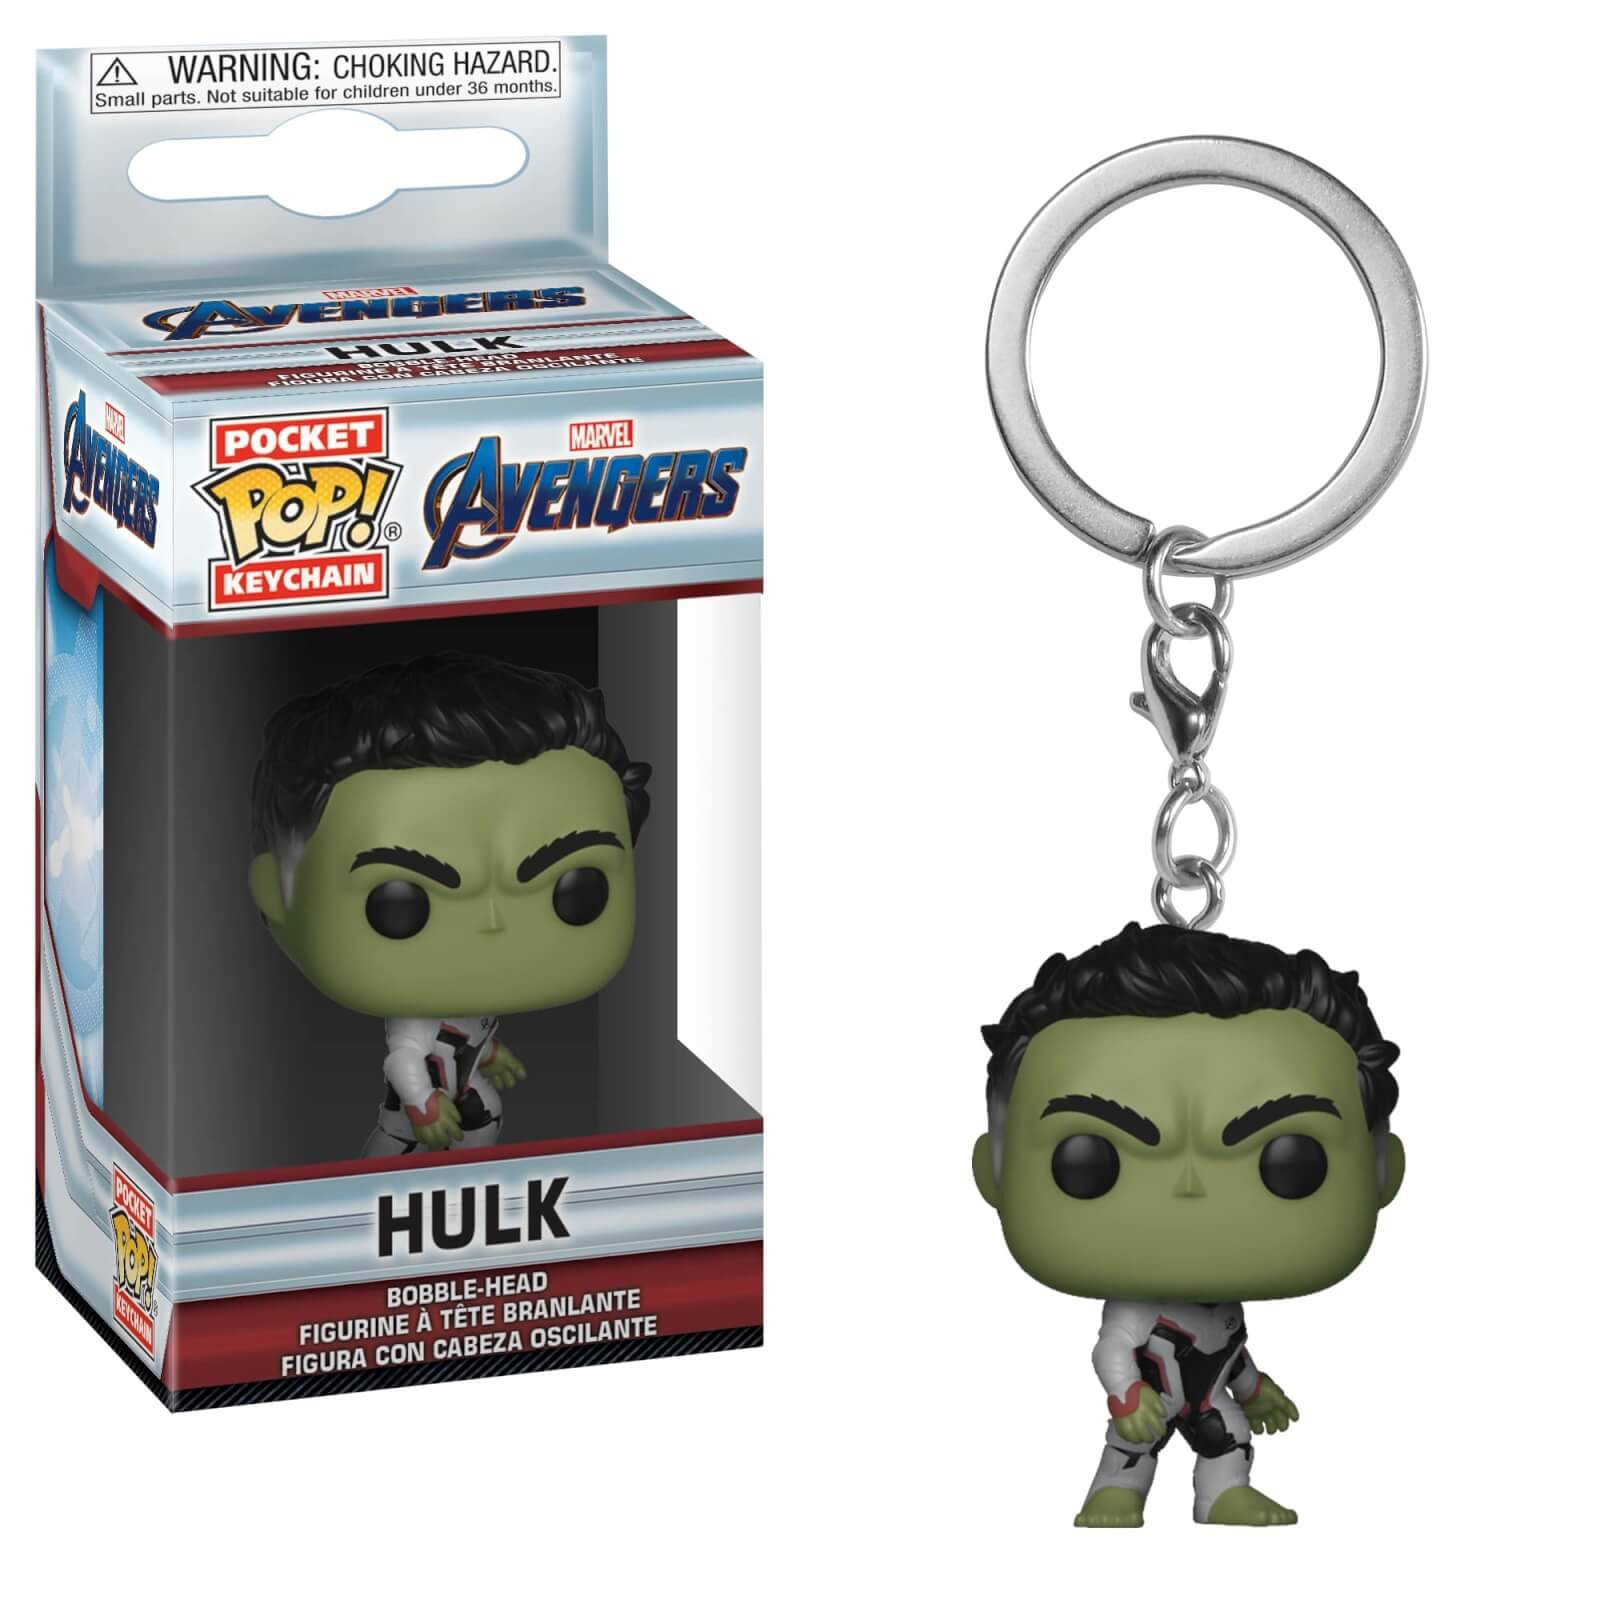 Pop! Keychain Porte Clé Pop! Keychain Marvel Avengers Endgame - Hulk